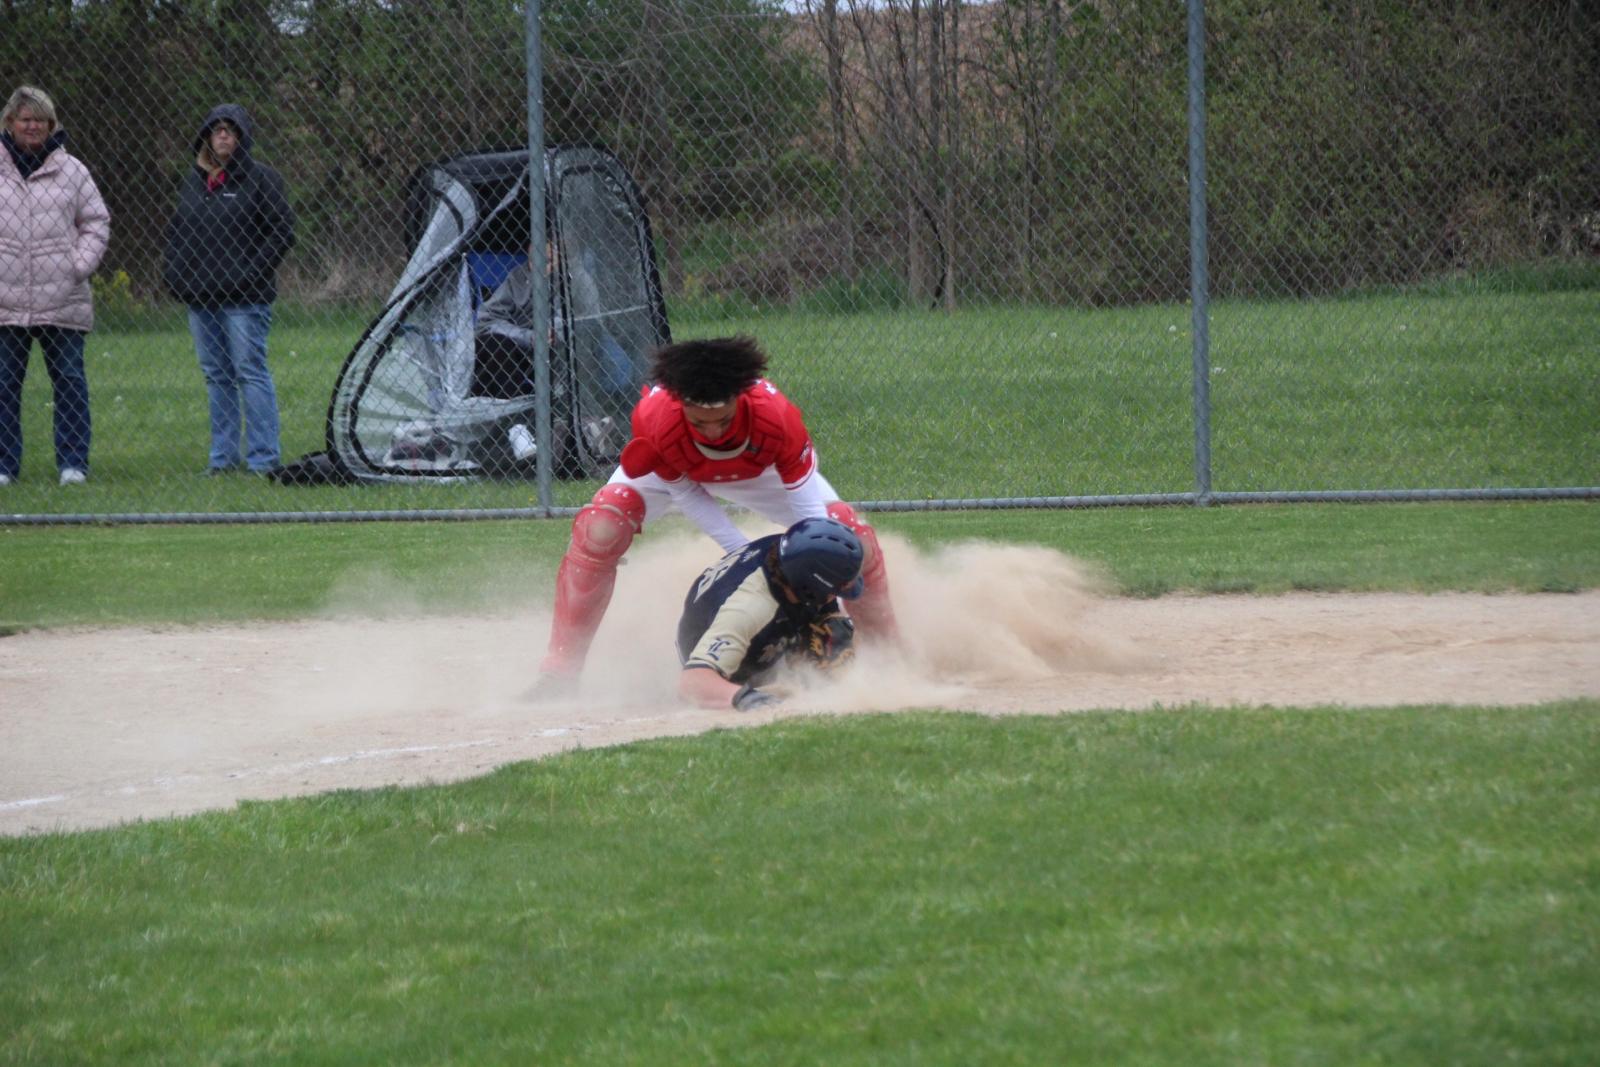 Varsity Baseball vs. Lakeview 5-4-21